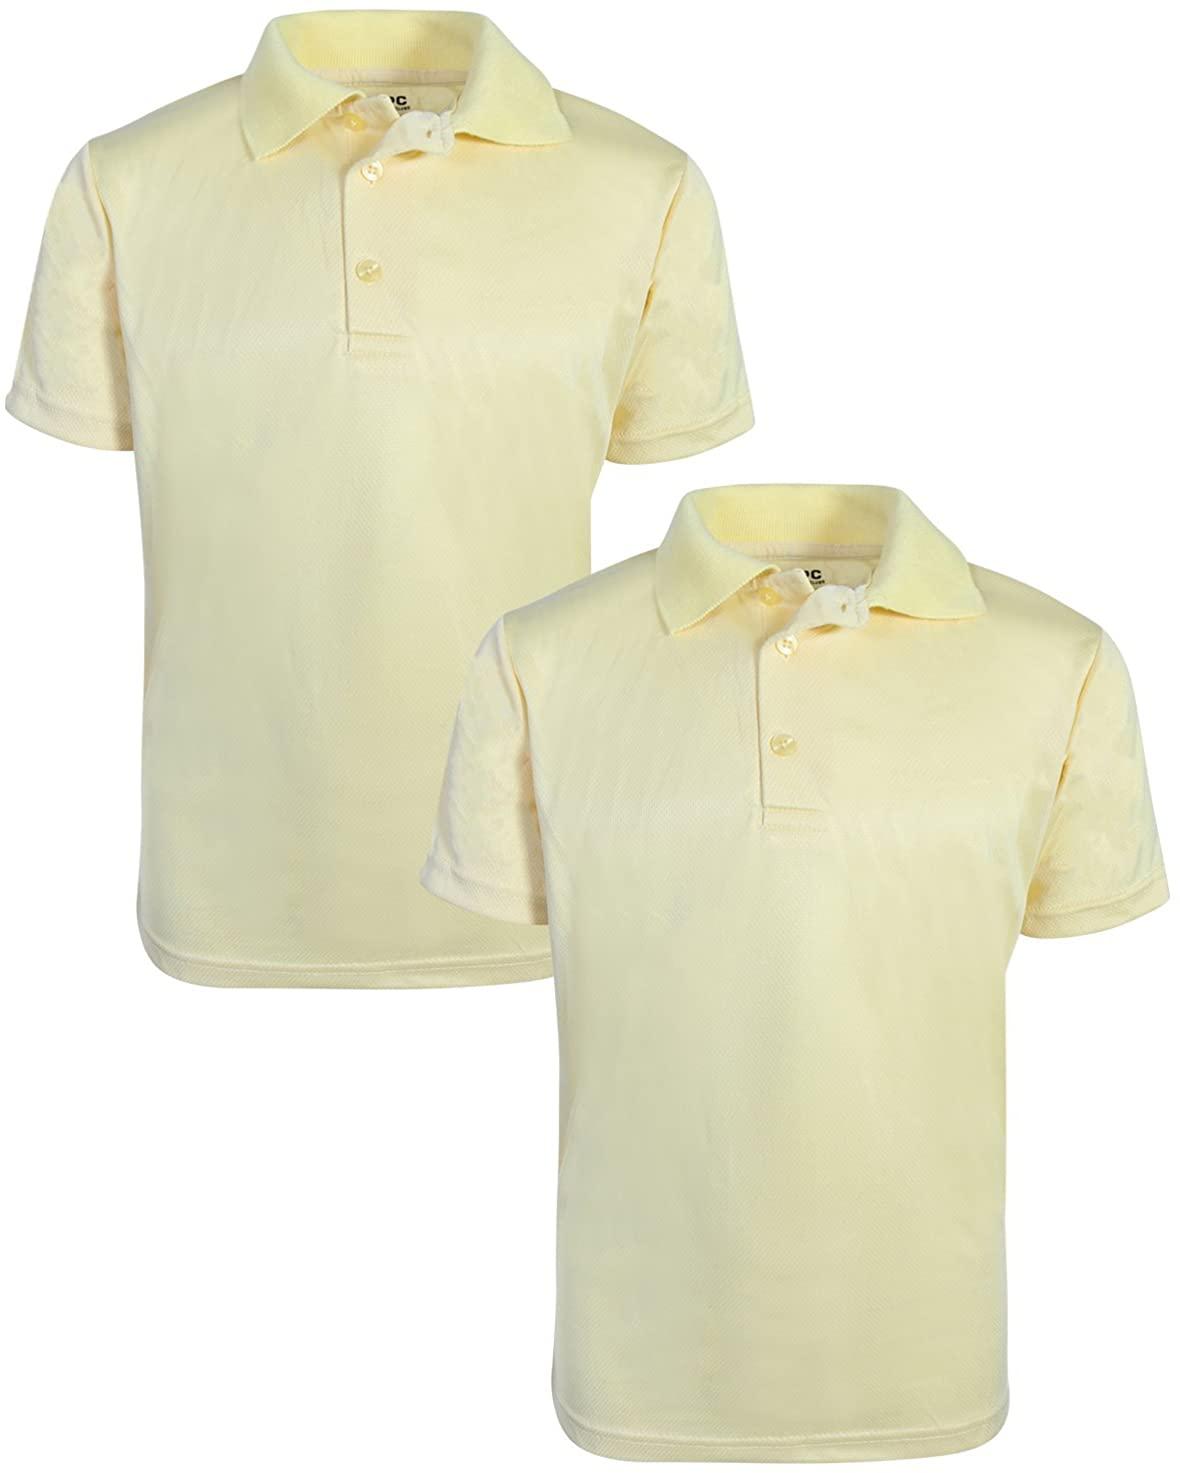 Beverly Hills Polo Club Boys Short Sleeve Dry-Fit Performance School Uniform Polo (2 Pack)